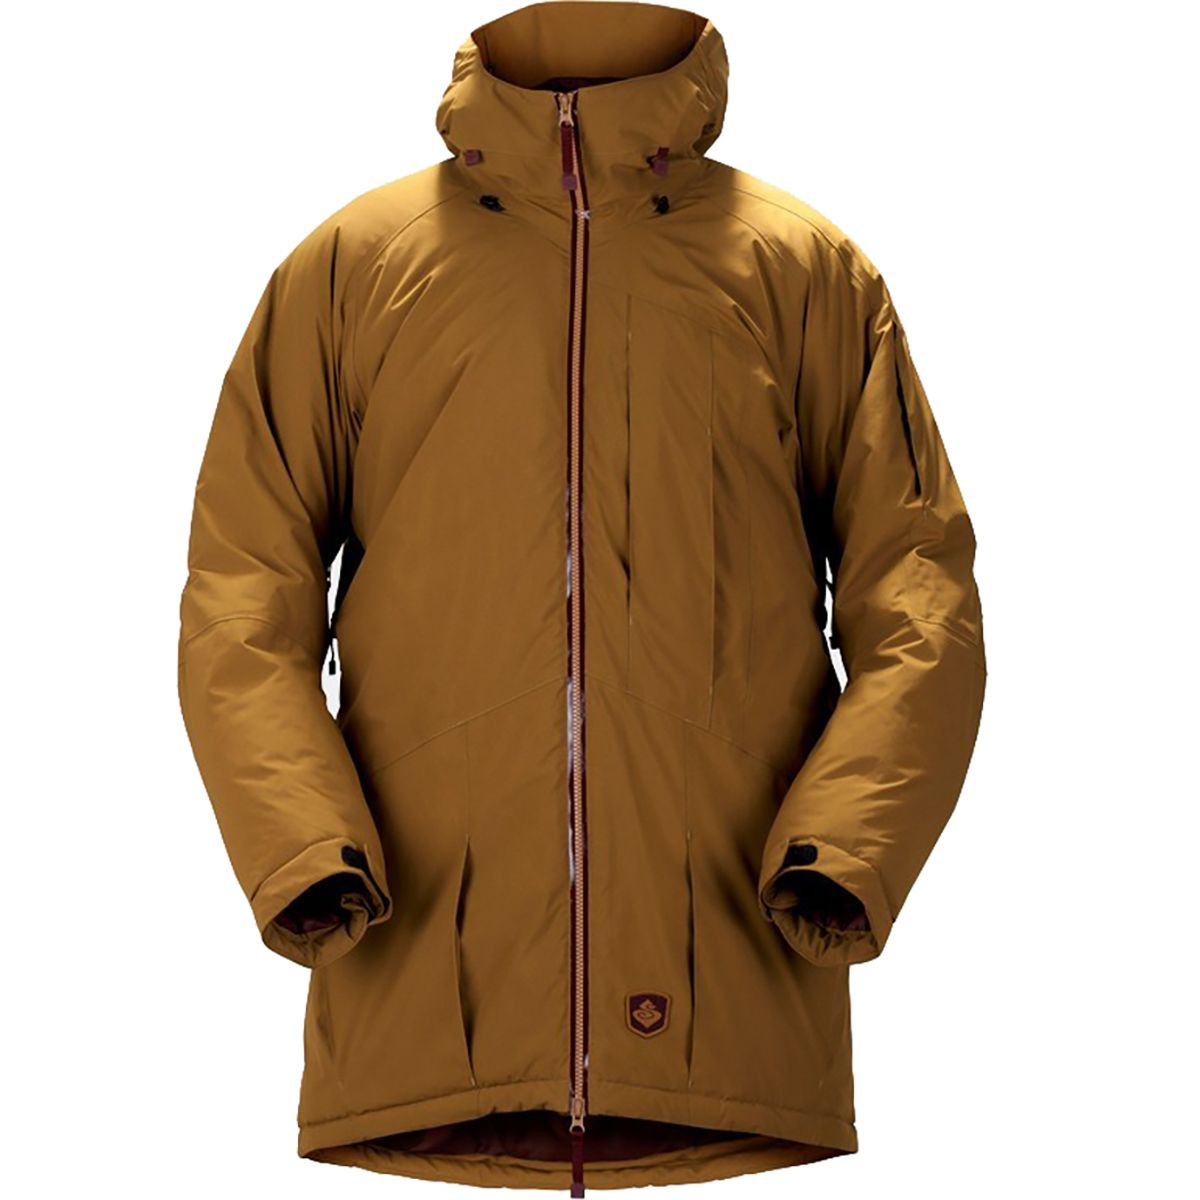 Sweet Protection Detroit Jacket - Men